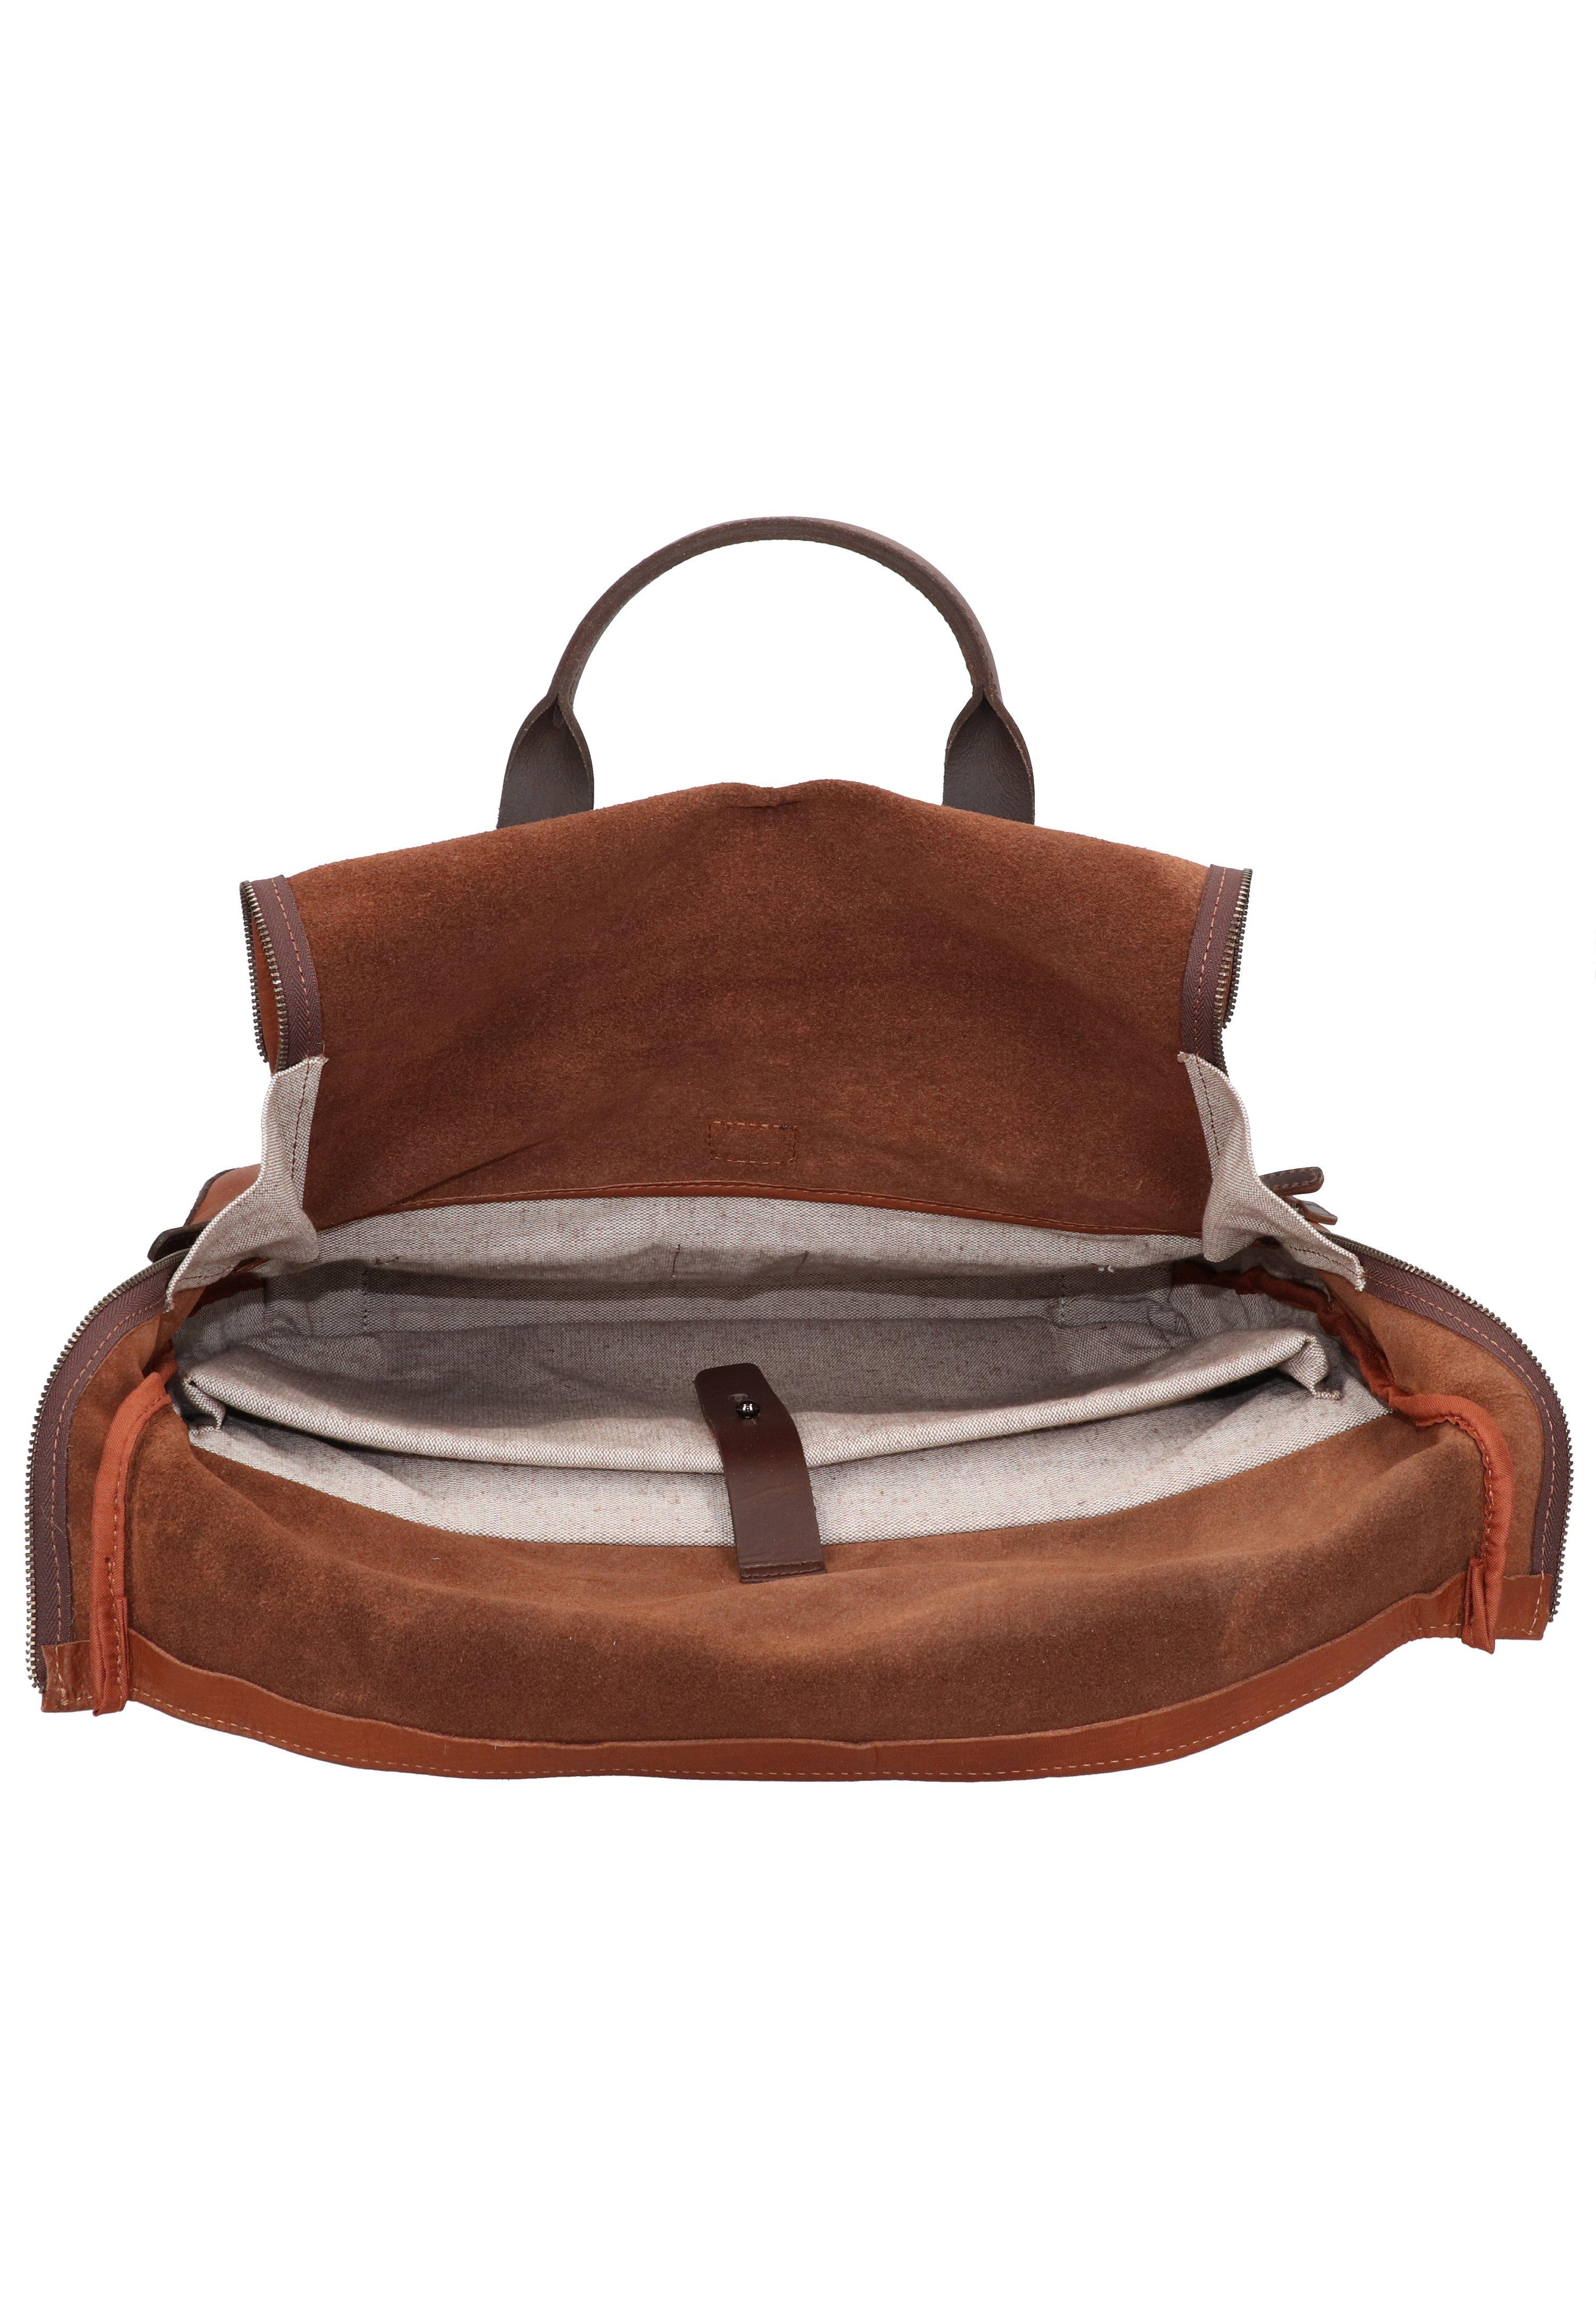 Harolds MOUNT  - Notebooktasche - cognac/brown/braun - Herrentaschen oHhAf